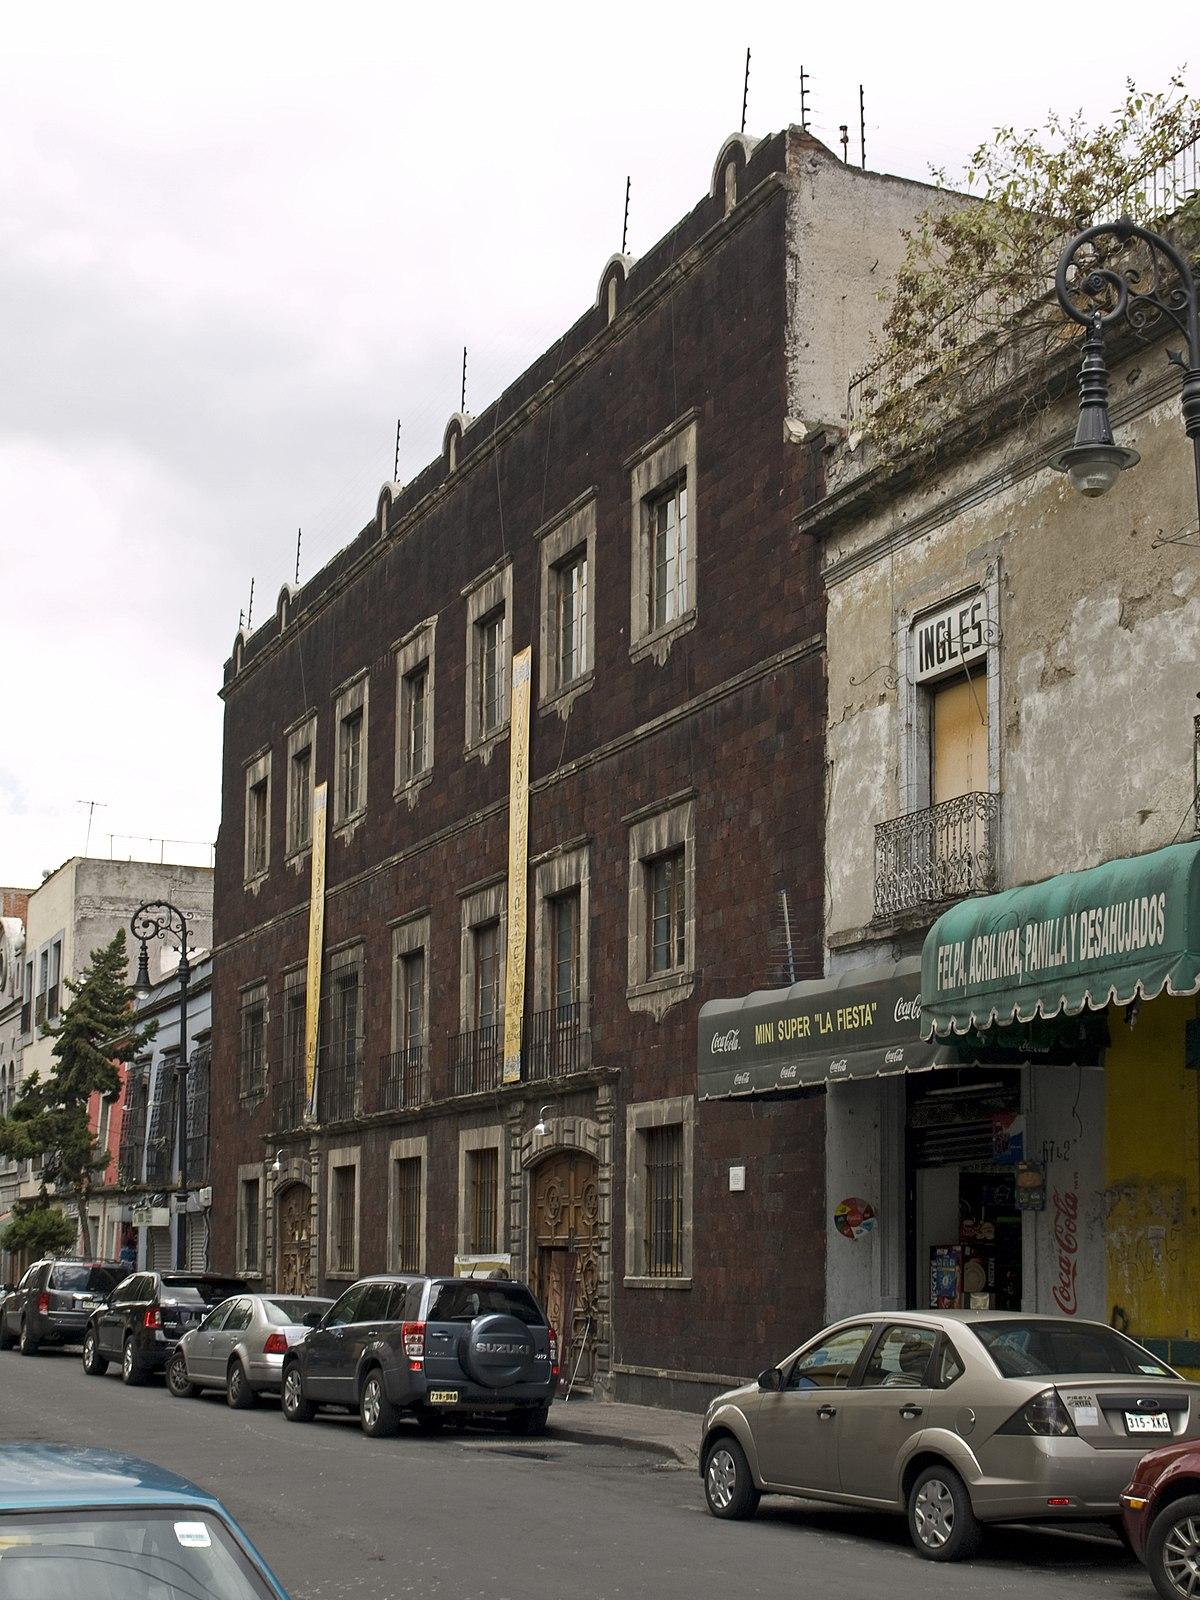 Historic Synagogue Justo Sierra 71